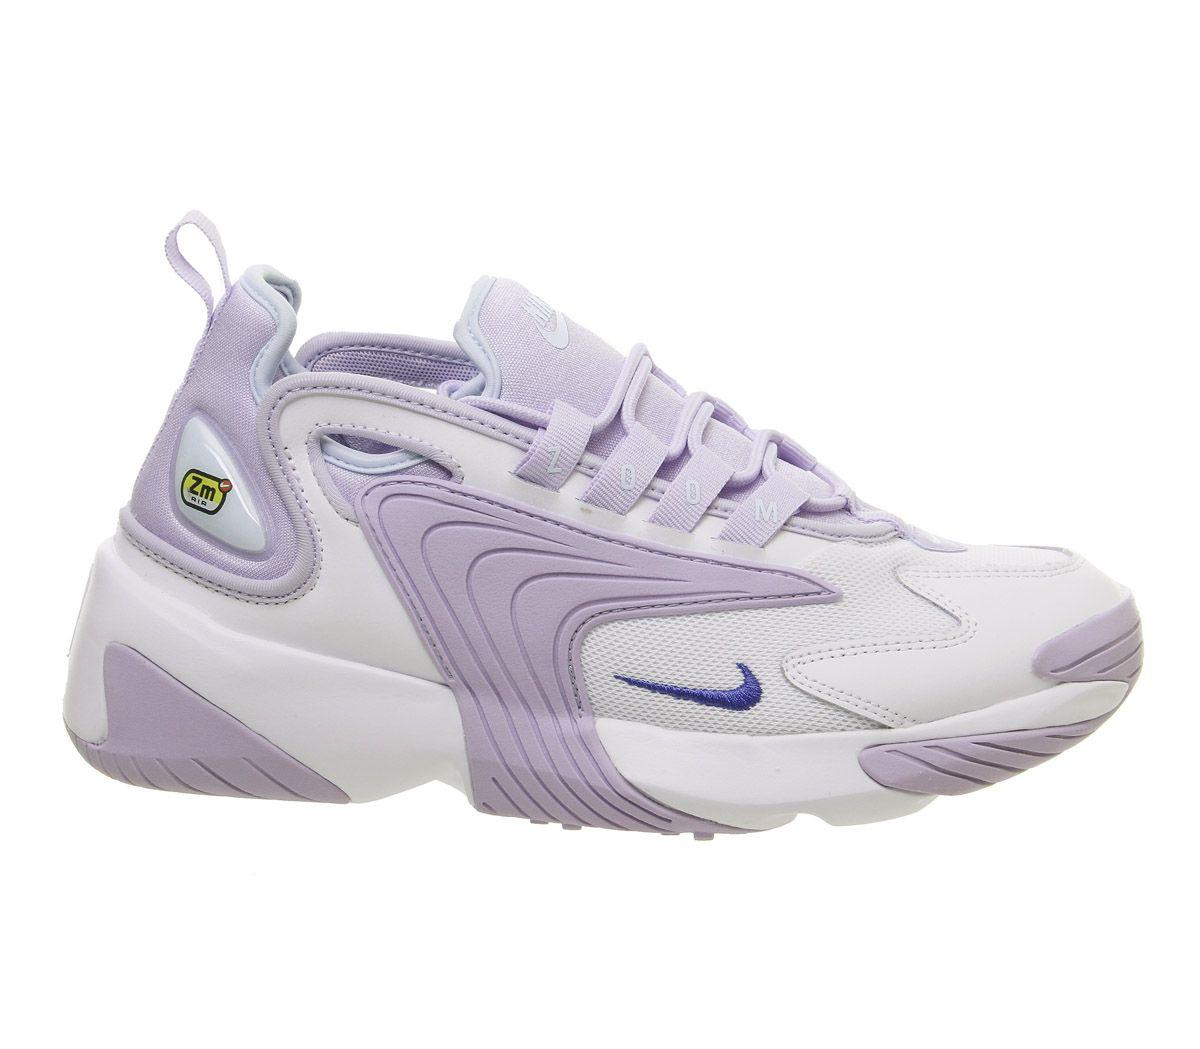 3f88defa66d7 Nike Zoom 2k Trainers White Sapphire Oxygen Purple Teal F - Hers ...